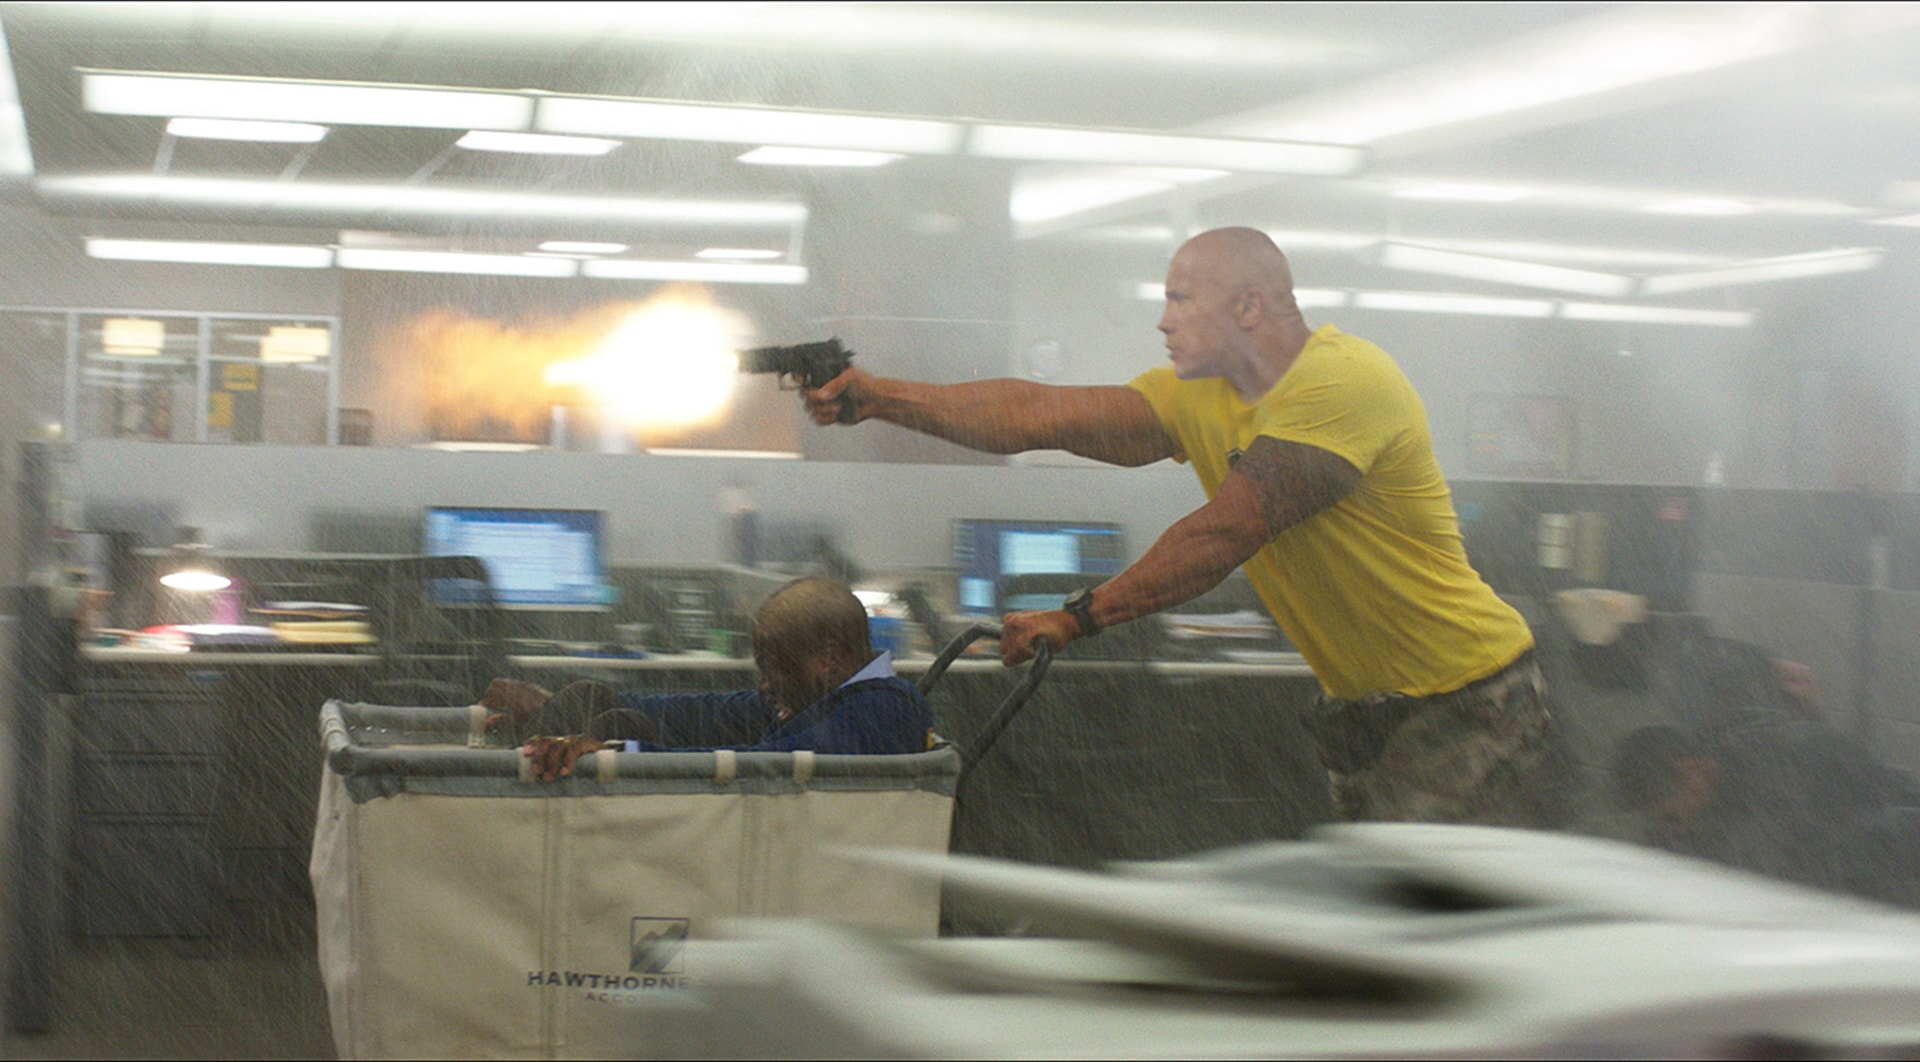 KEVIN HART as Calvin and DWAYNE JOHNSON as Bob pushing mail cart and shooting firearm